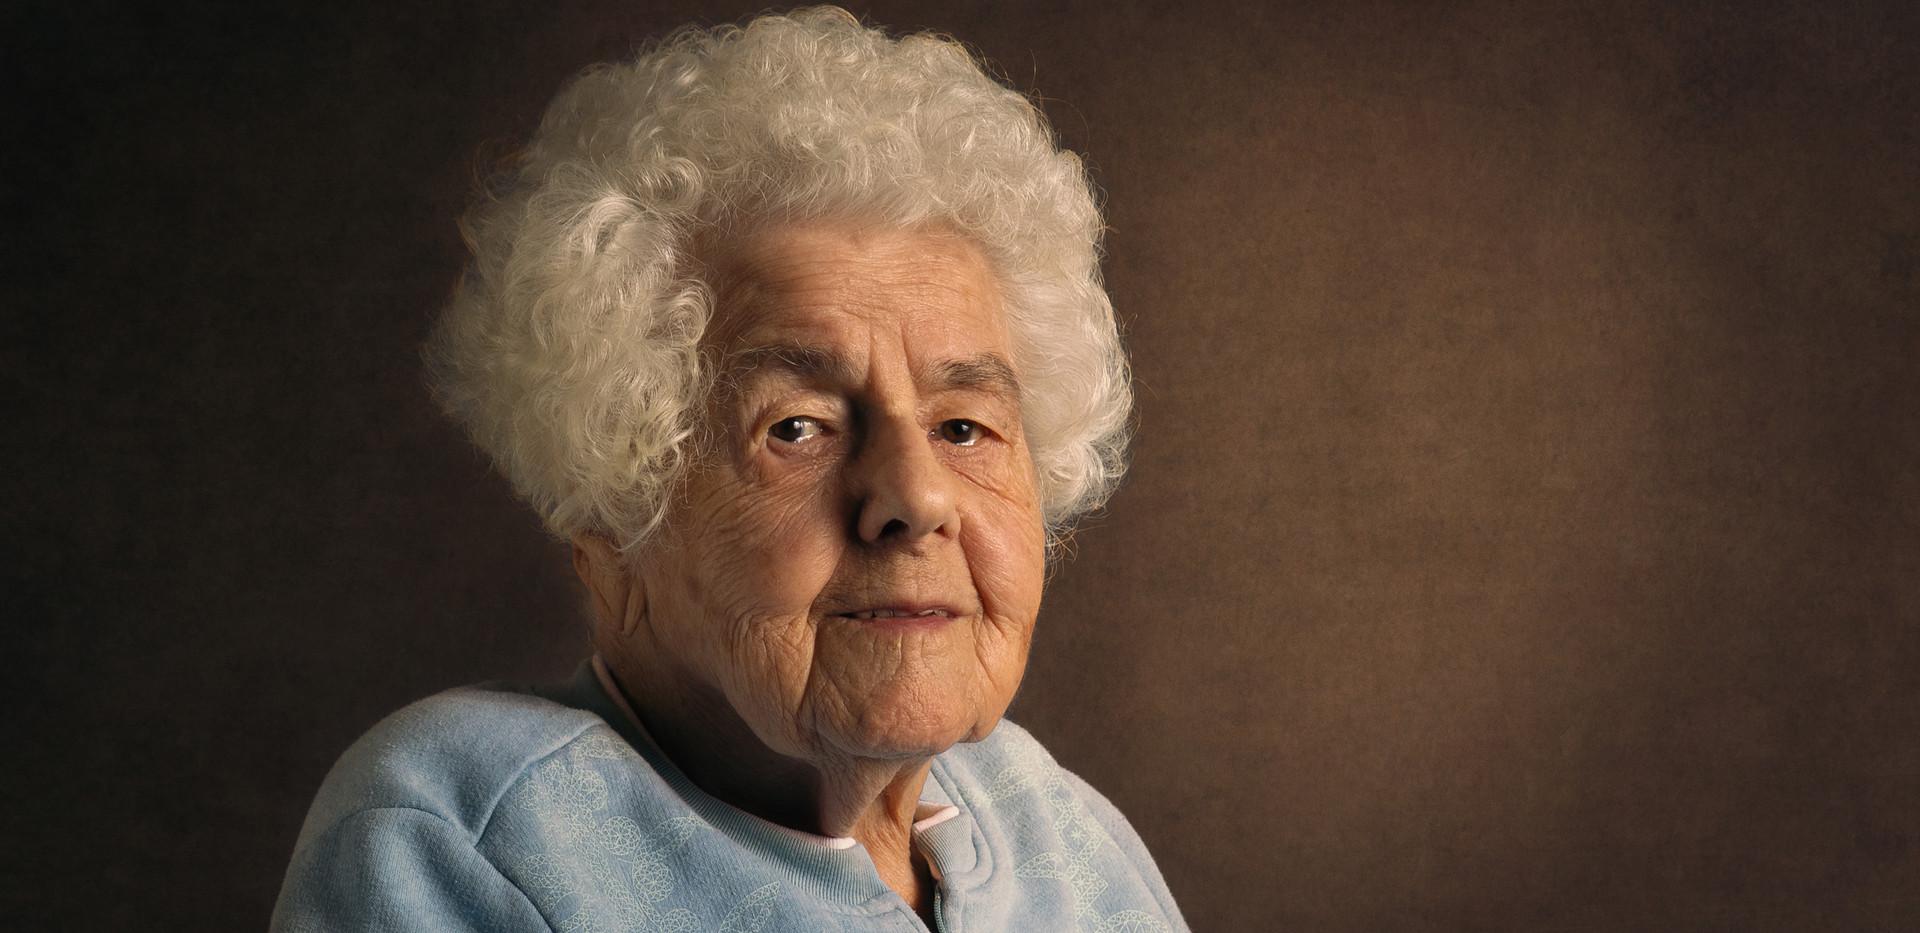 Centenarian_6_Mabel_HR.jpg